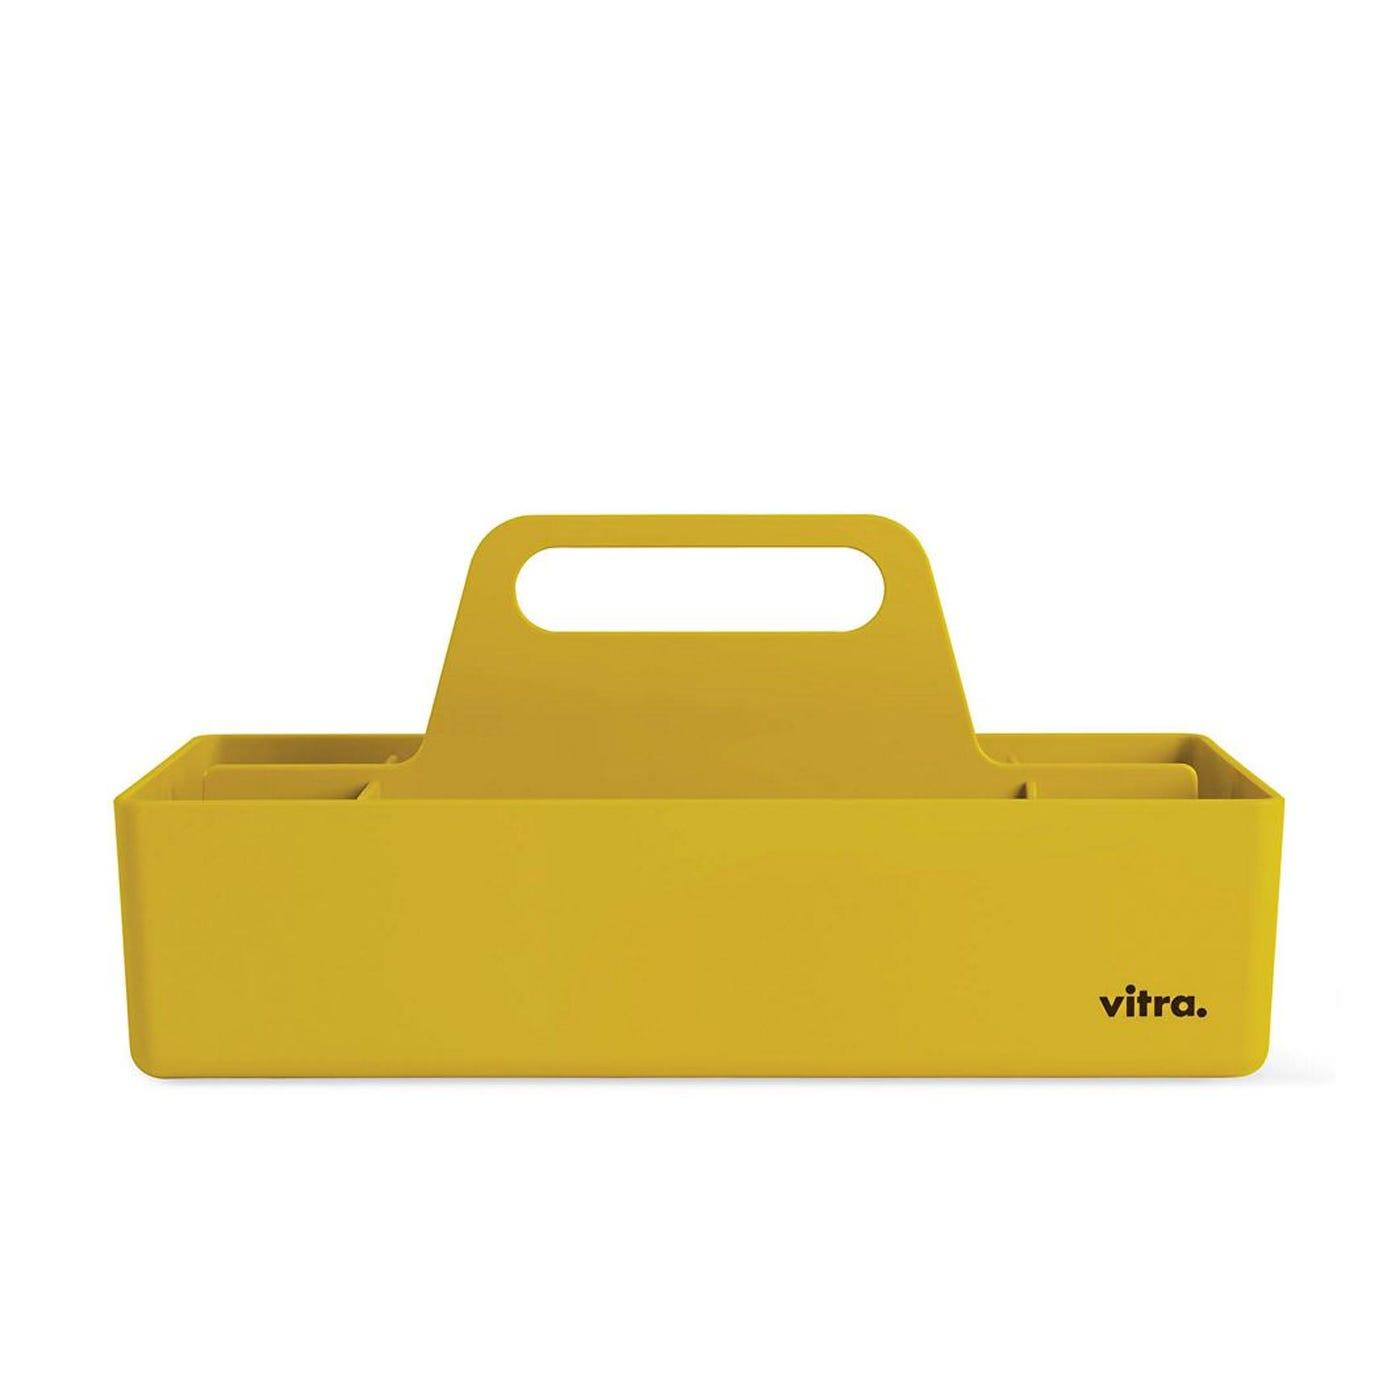 Vitra Tool Box In Mustard